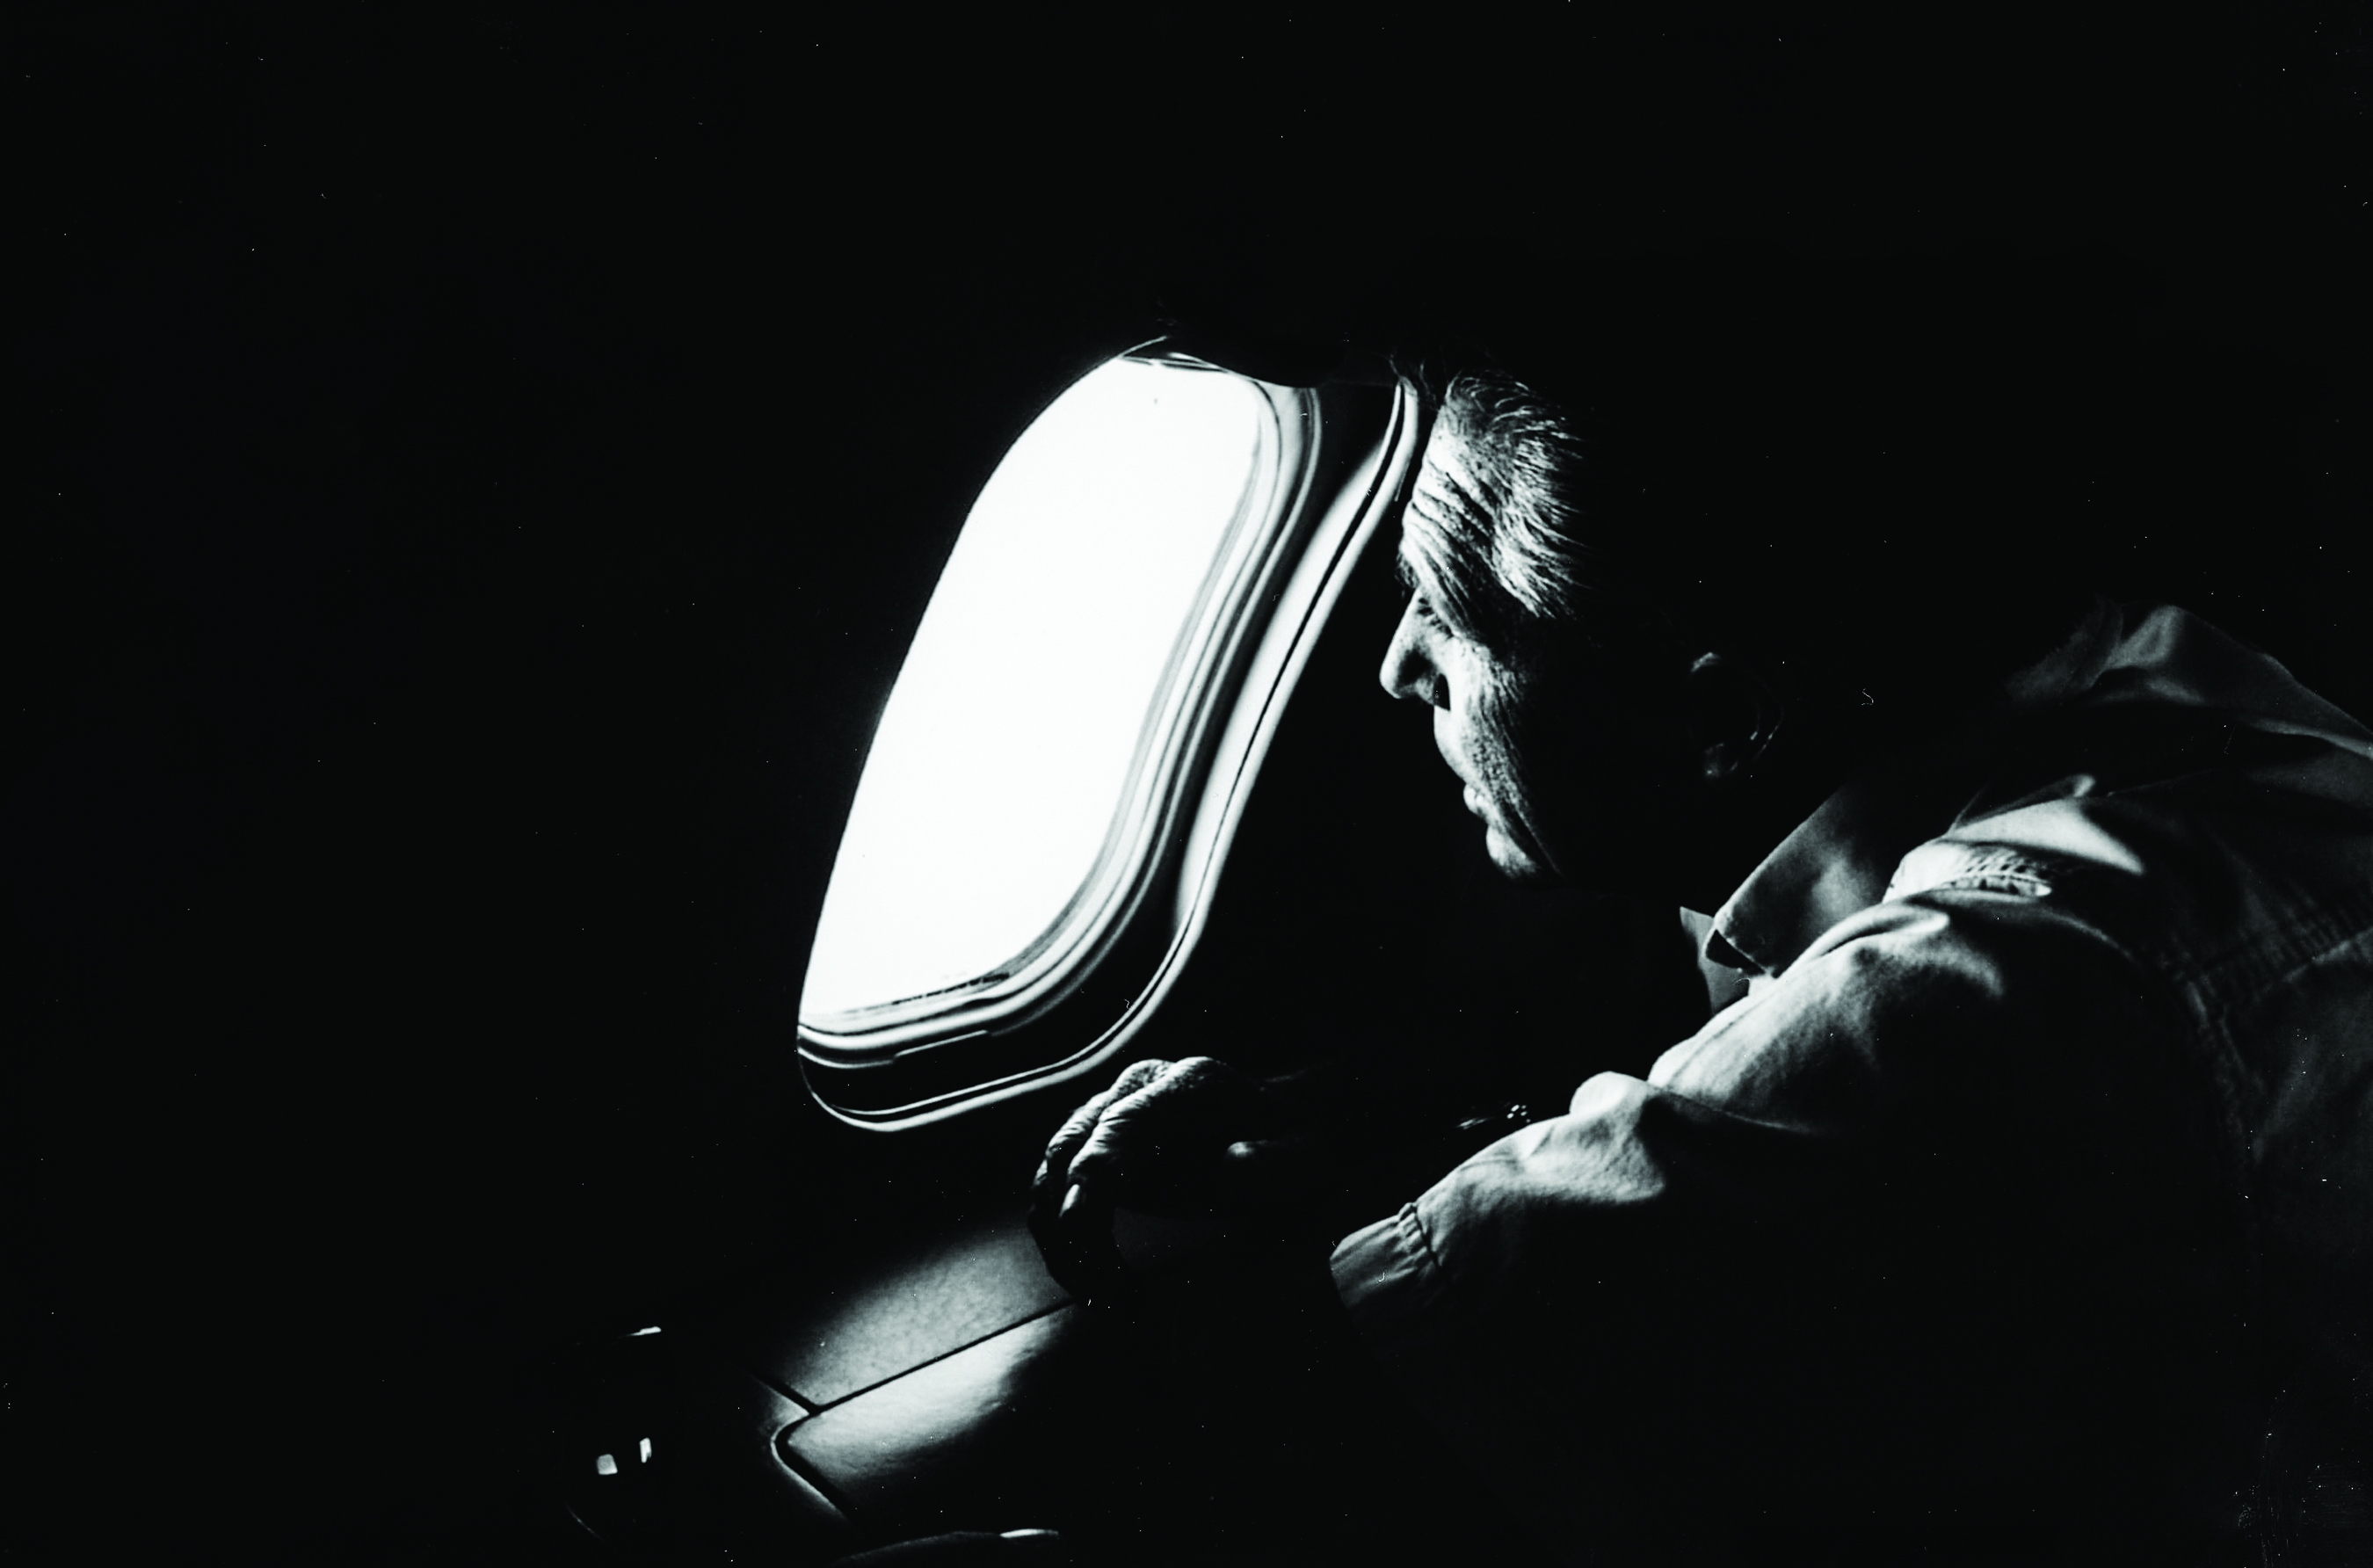 2000s gp on plane